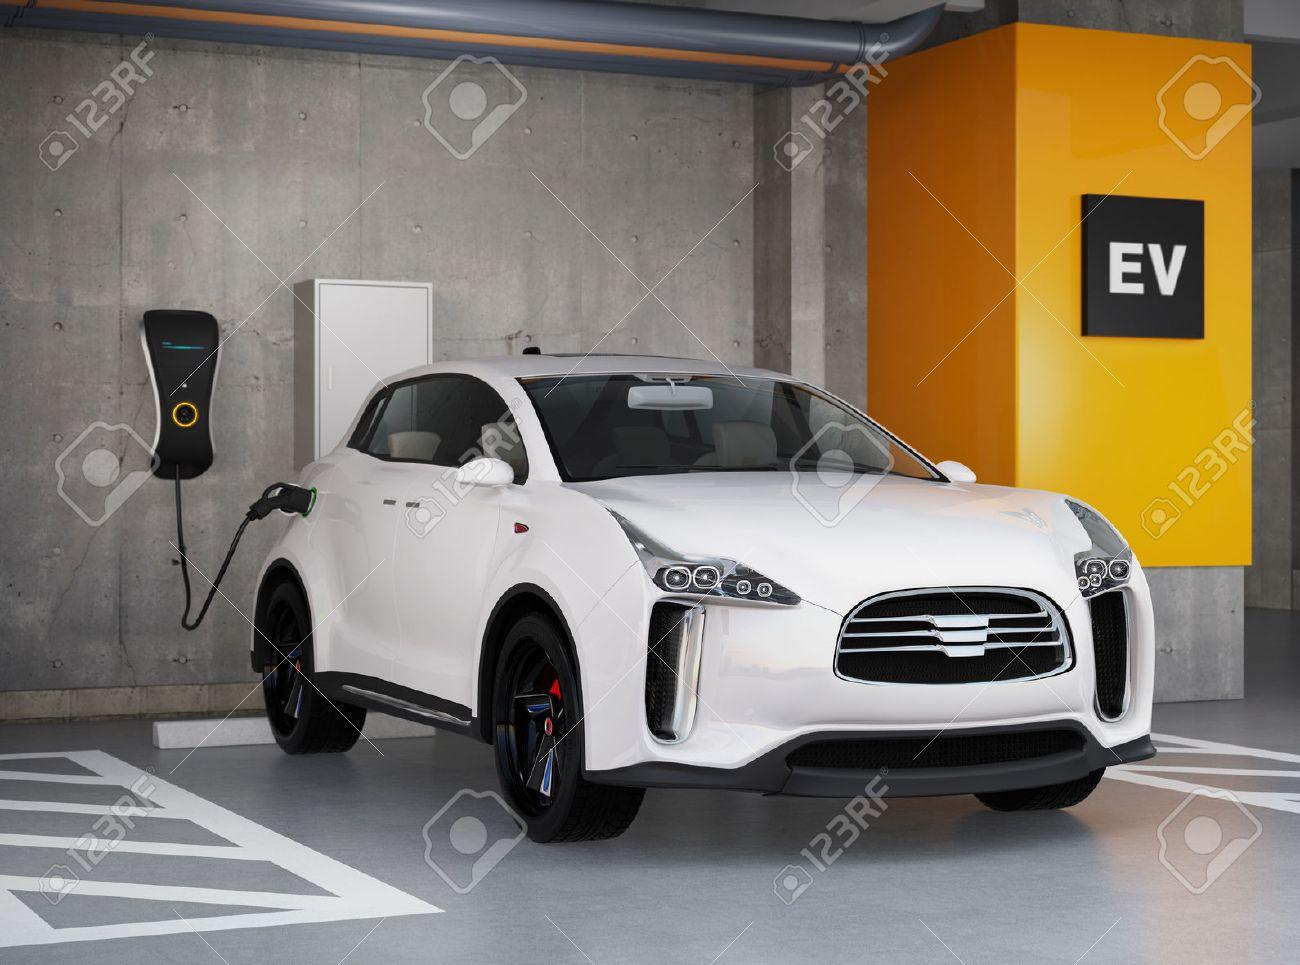 White electric SUV recharging in parking garage. 3D rendering image. original design. - 65788208